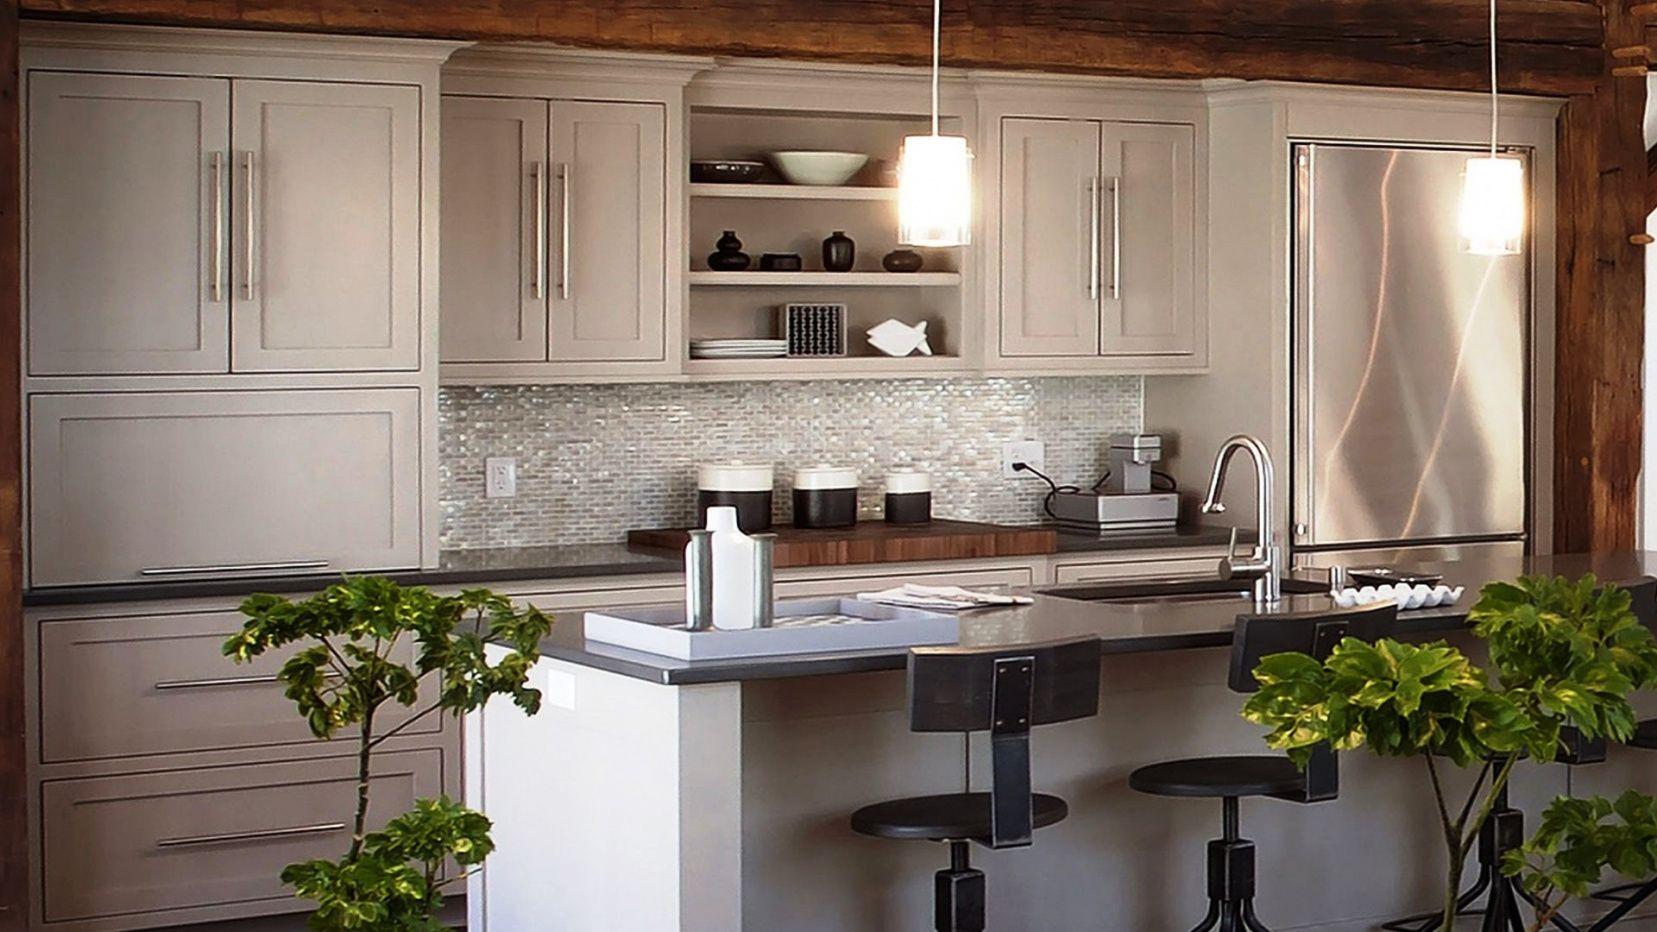 70 Granite Countertops Bradenton Fl Chalkboard Ideas For Kitchen Check More At Http